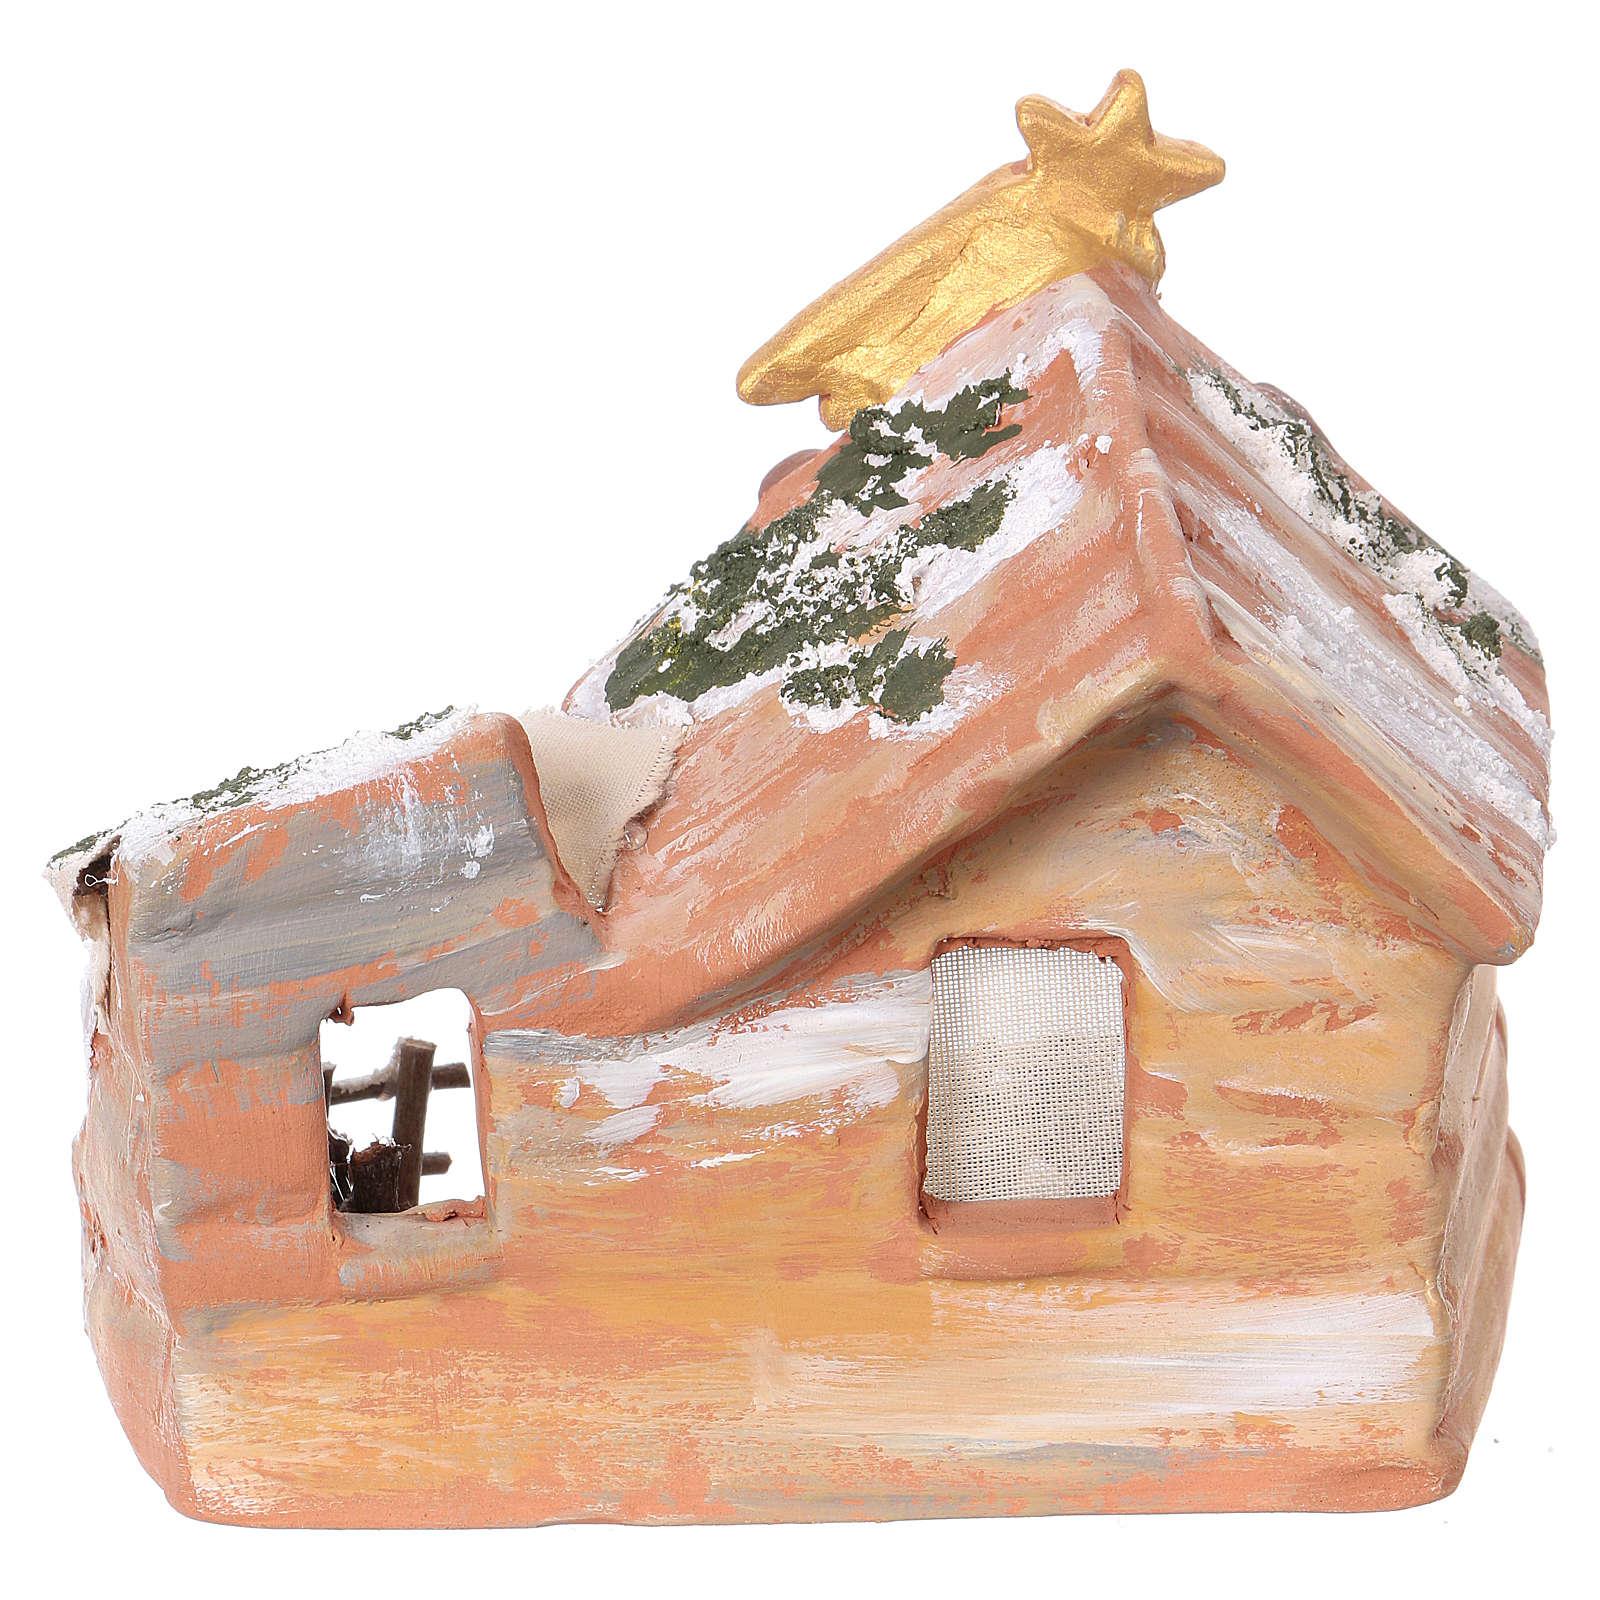 Capanna 15x15x10 cm con natività 6 cm in terracotta dipinta Deruta 4